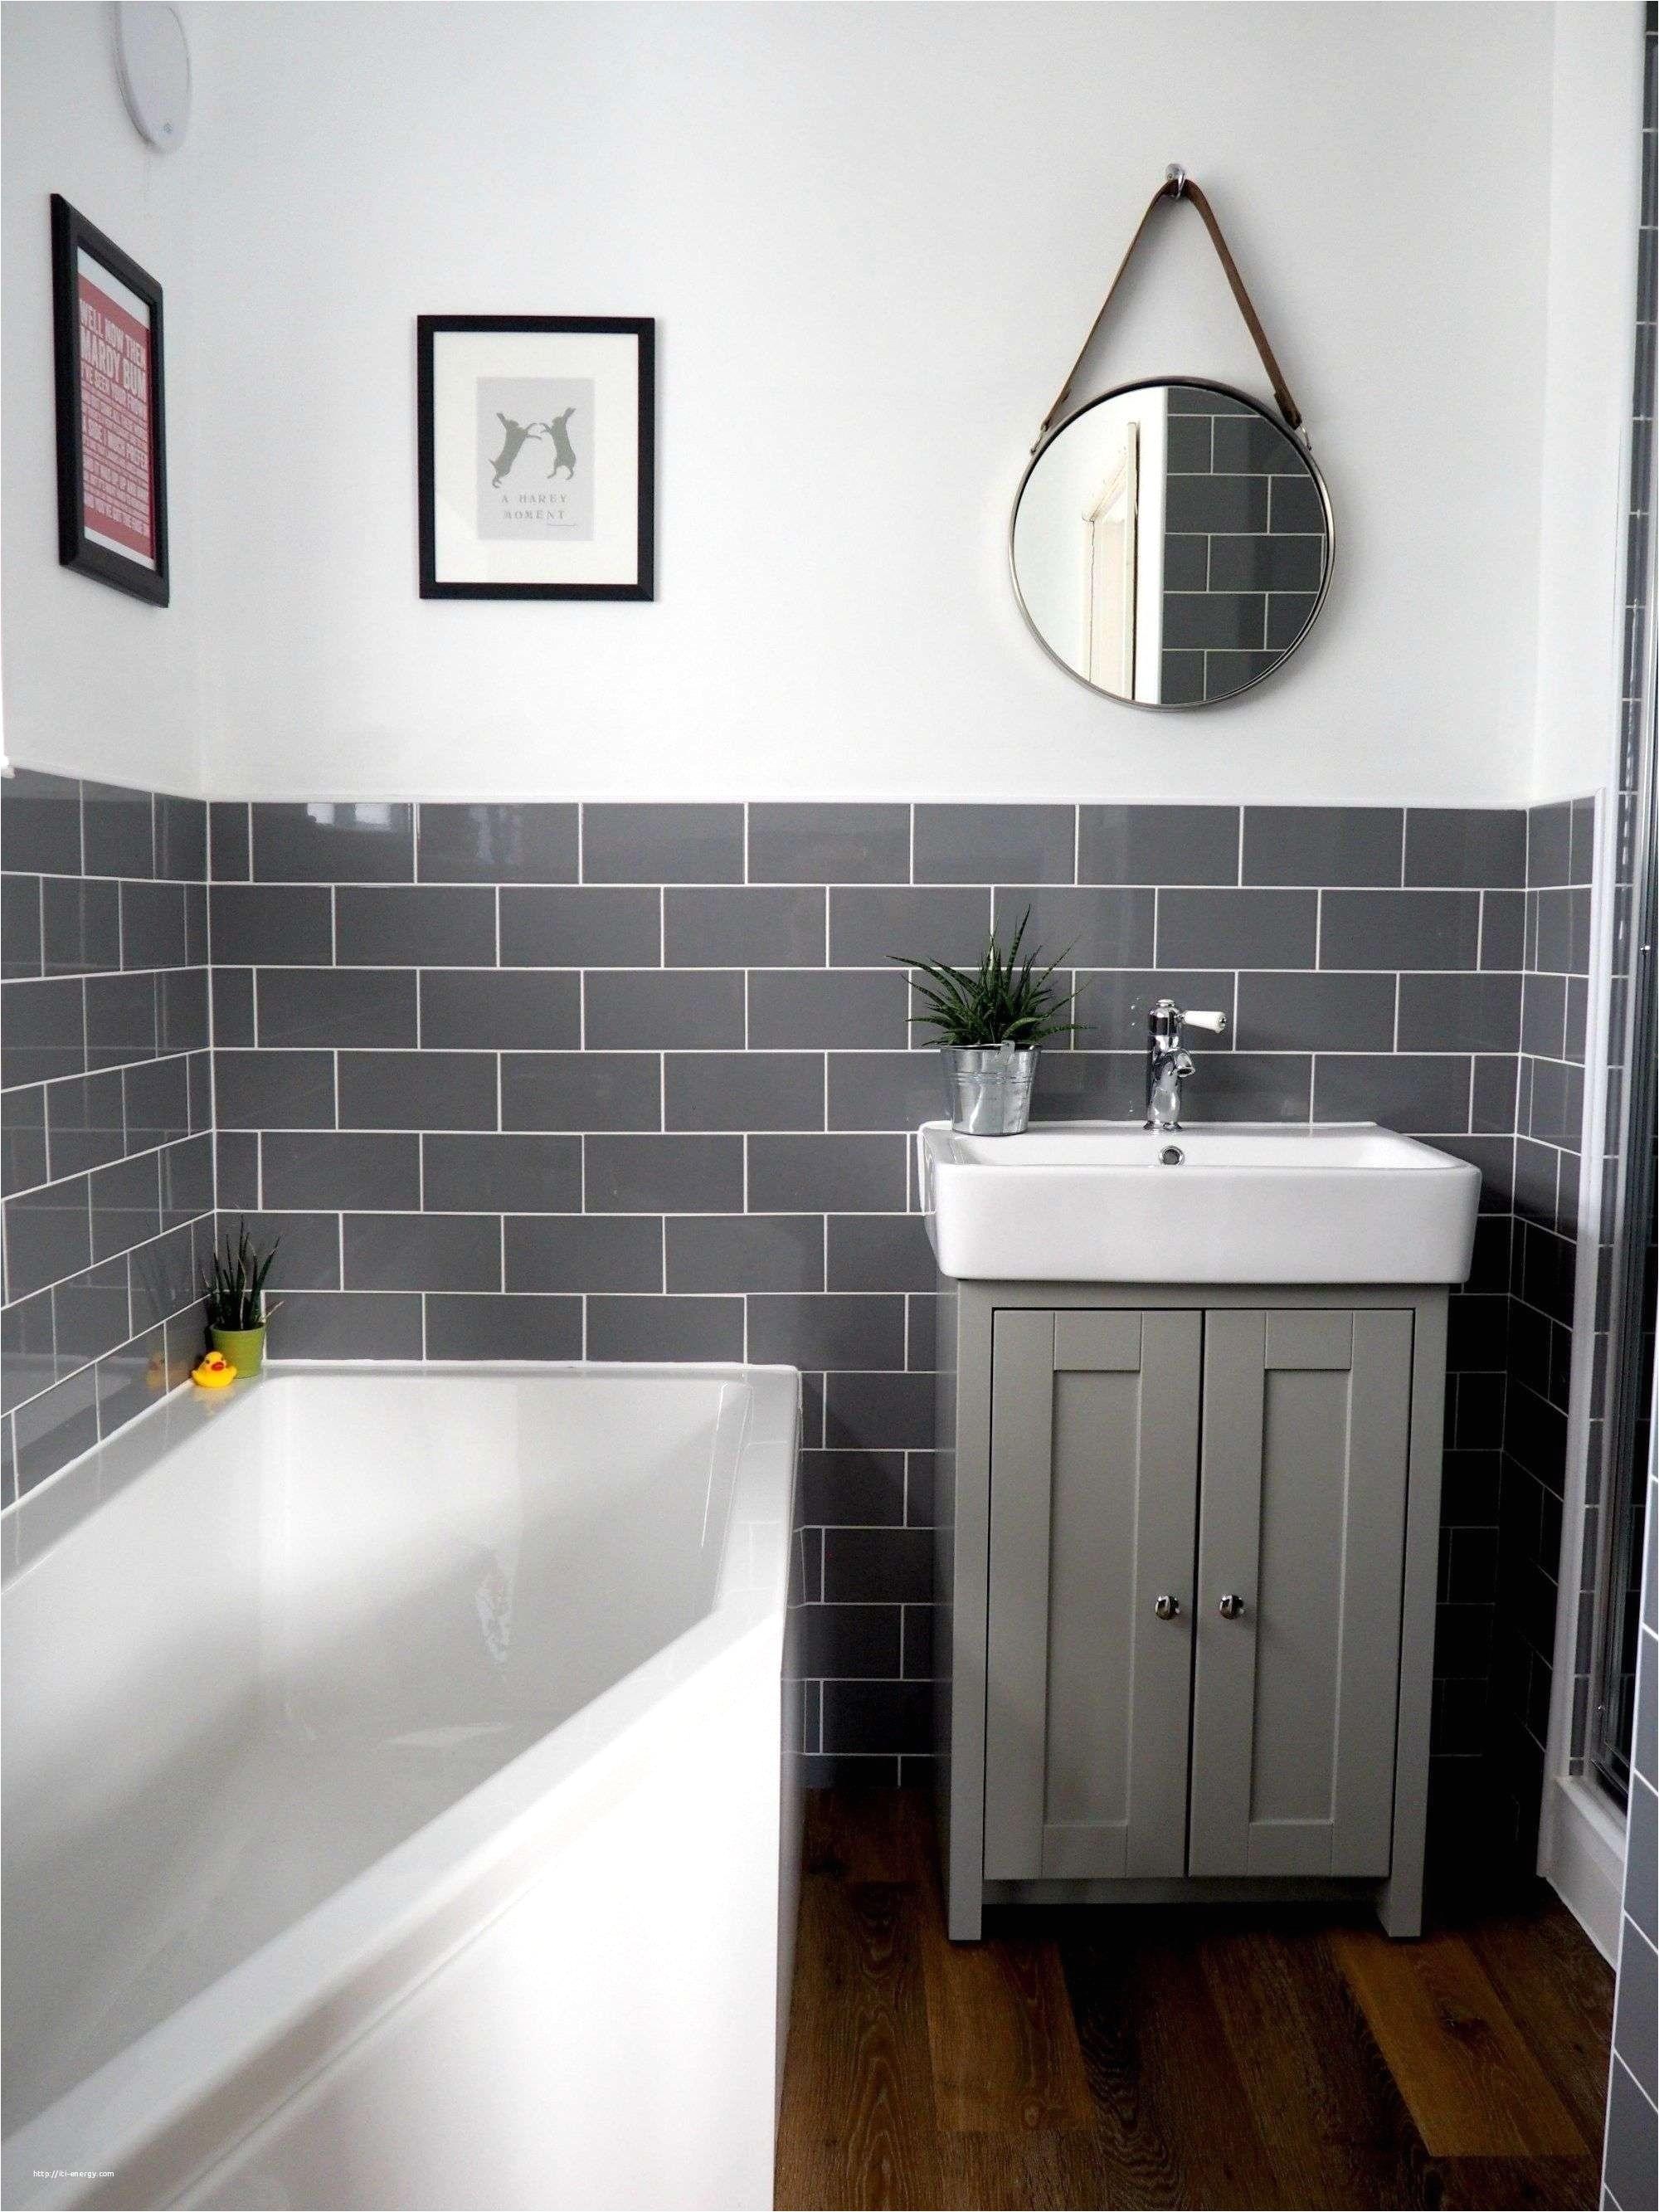 Modern Bathroom Accessories Lovely Elegant Tile Bathroom Ideas Elegant Gray Bathroom 0d Than Modern New Spa Bathroom Design